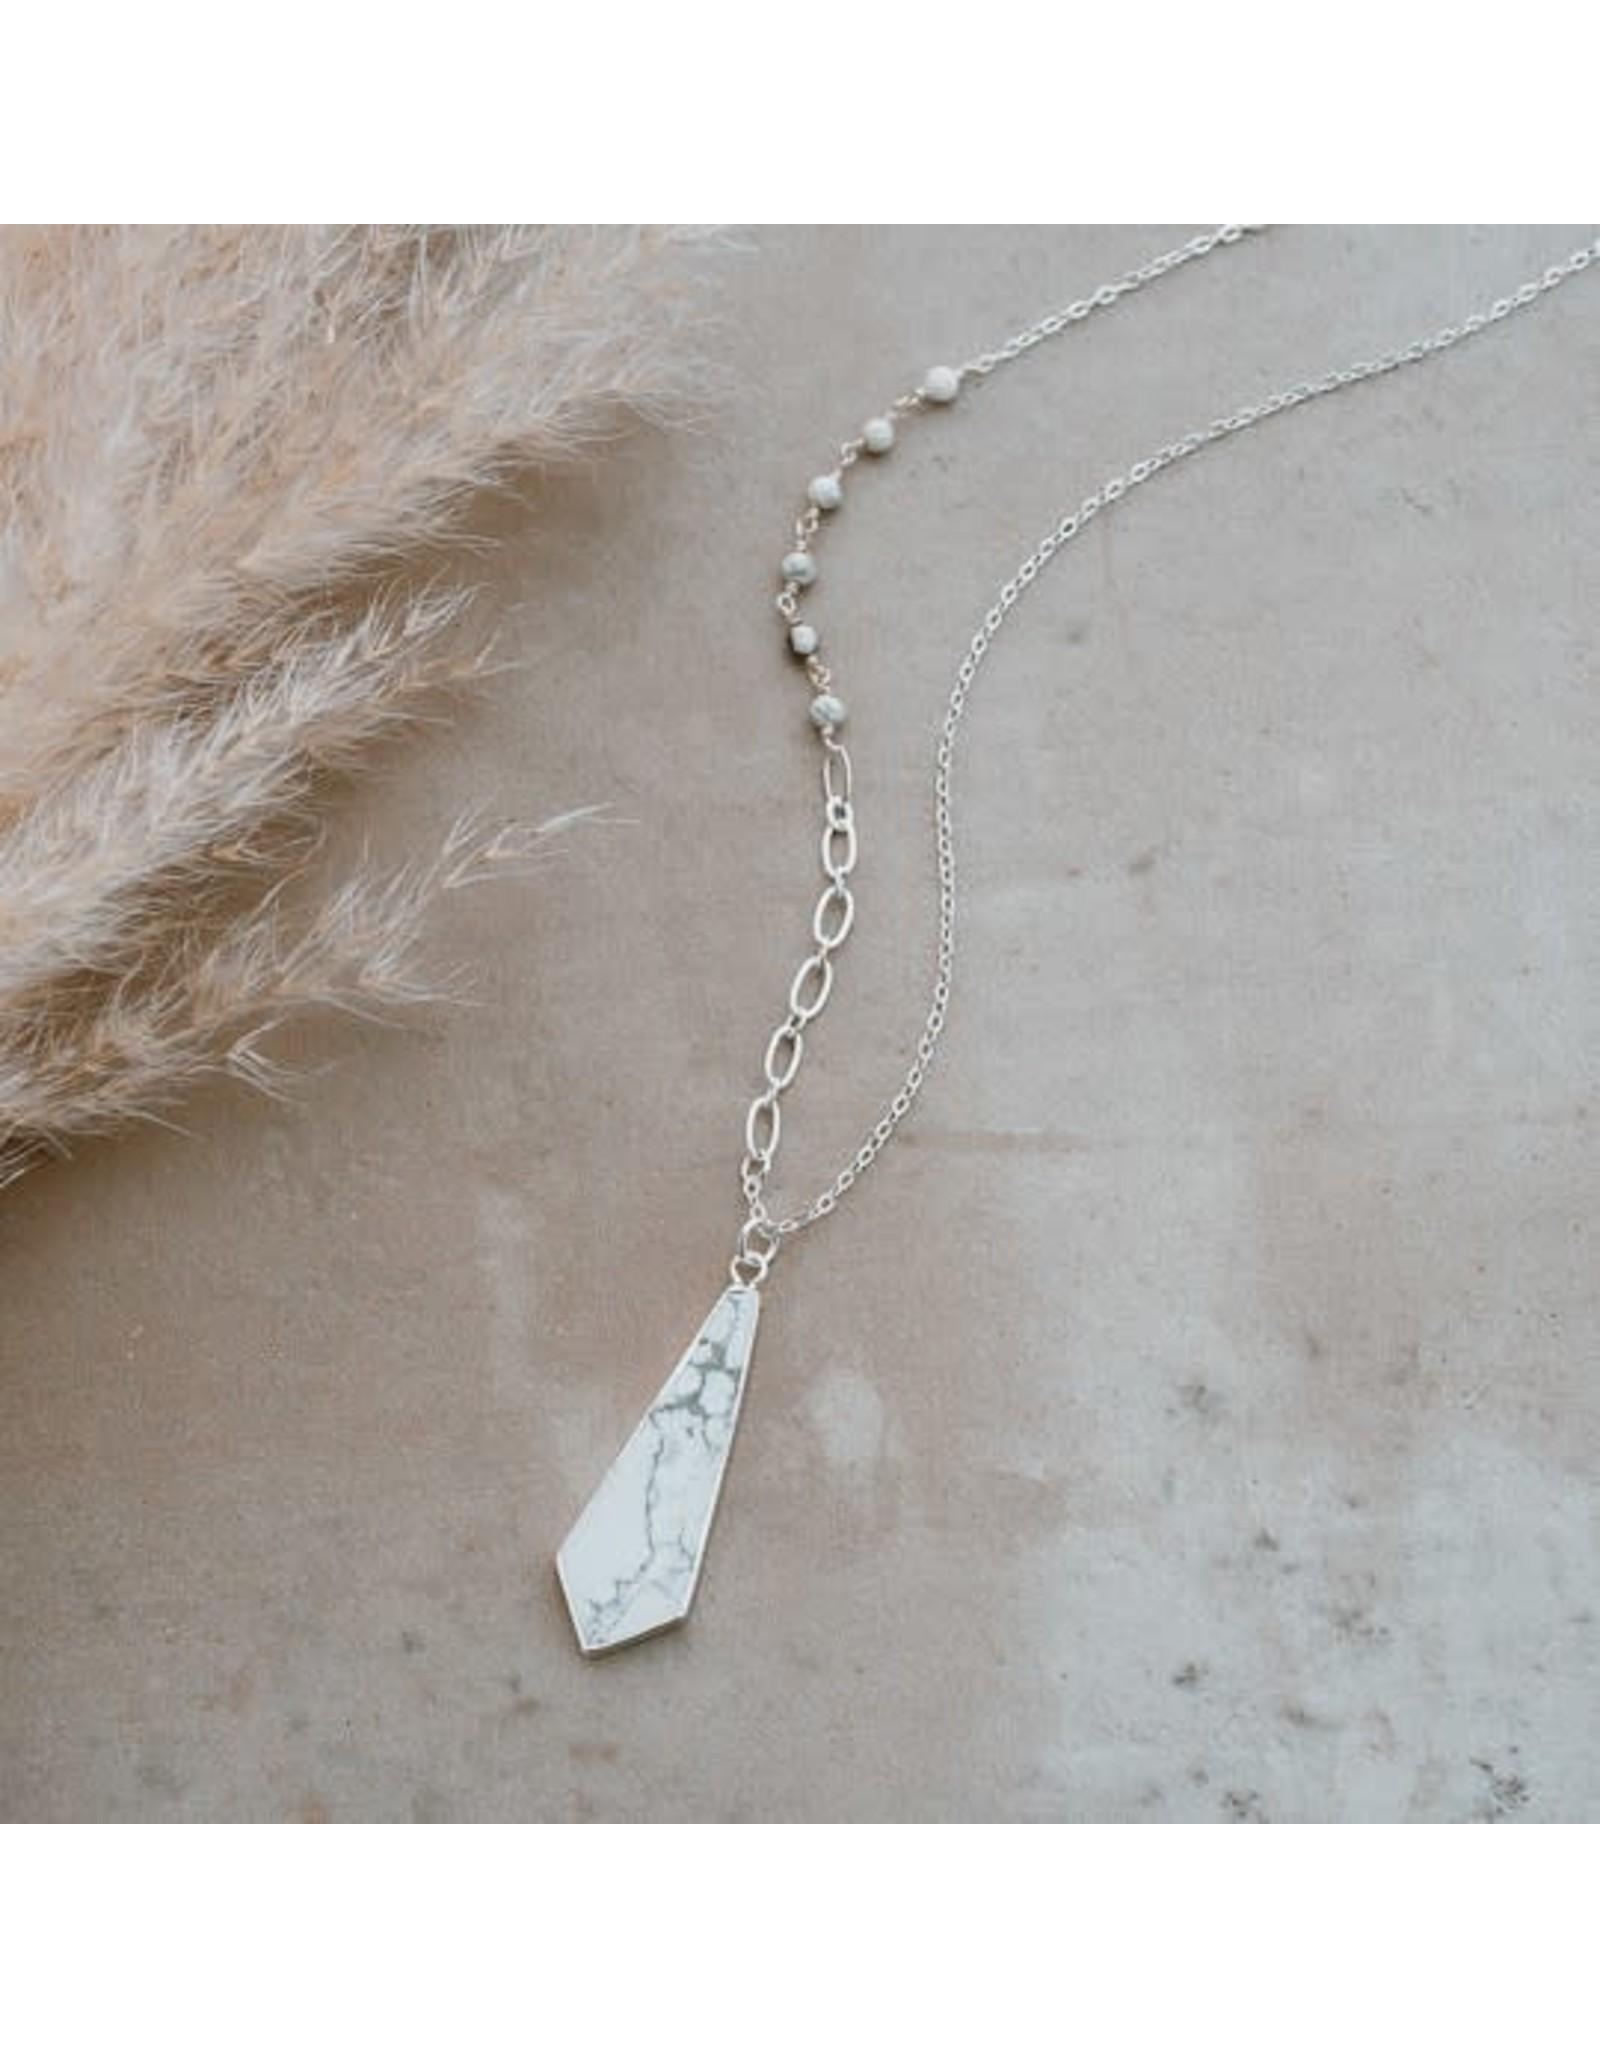 Glee jewelry Avalon Necklace, Gold/howlite